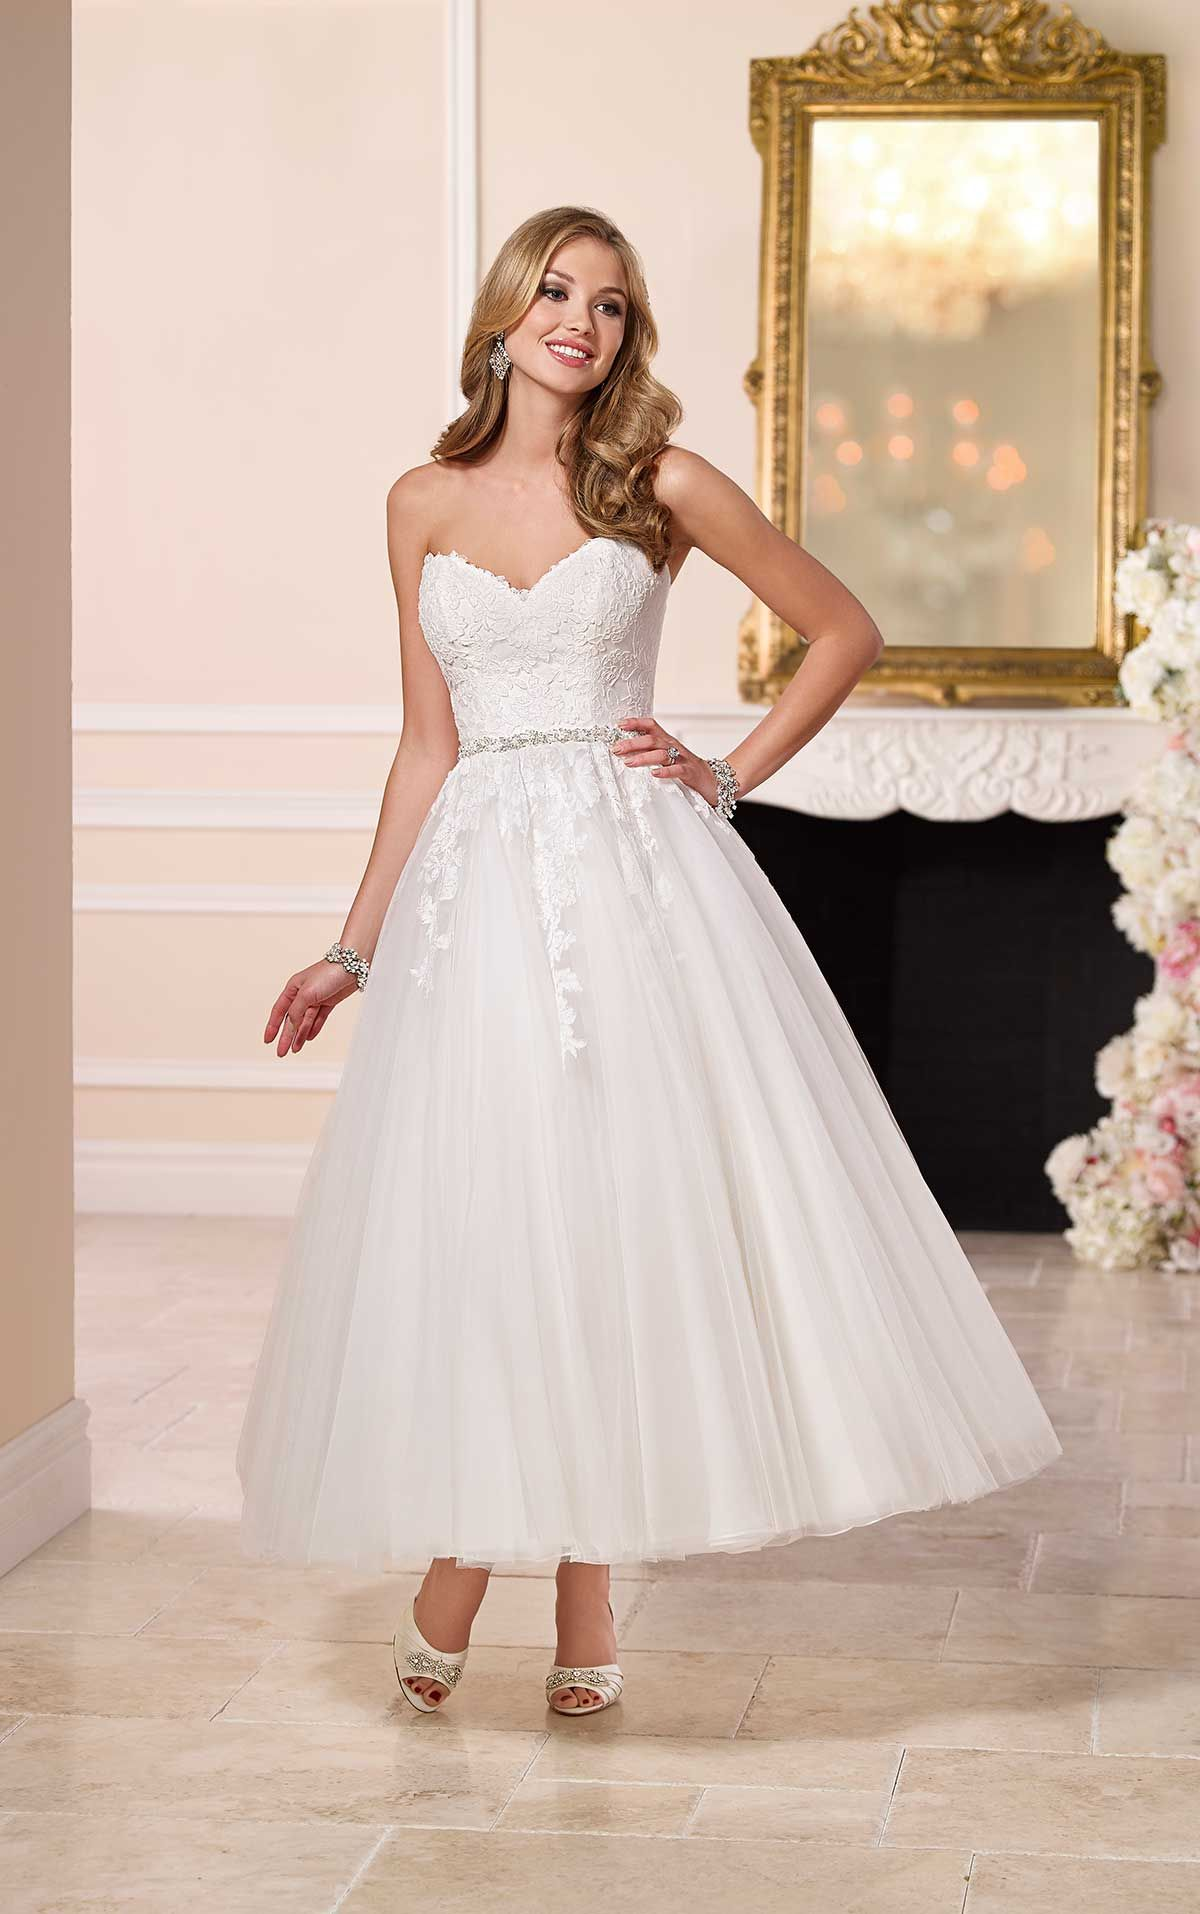 1950s Tea Length Short Wedding Dress Tea length wedding